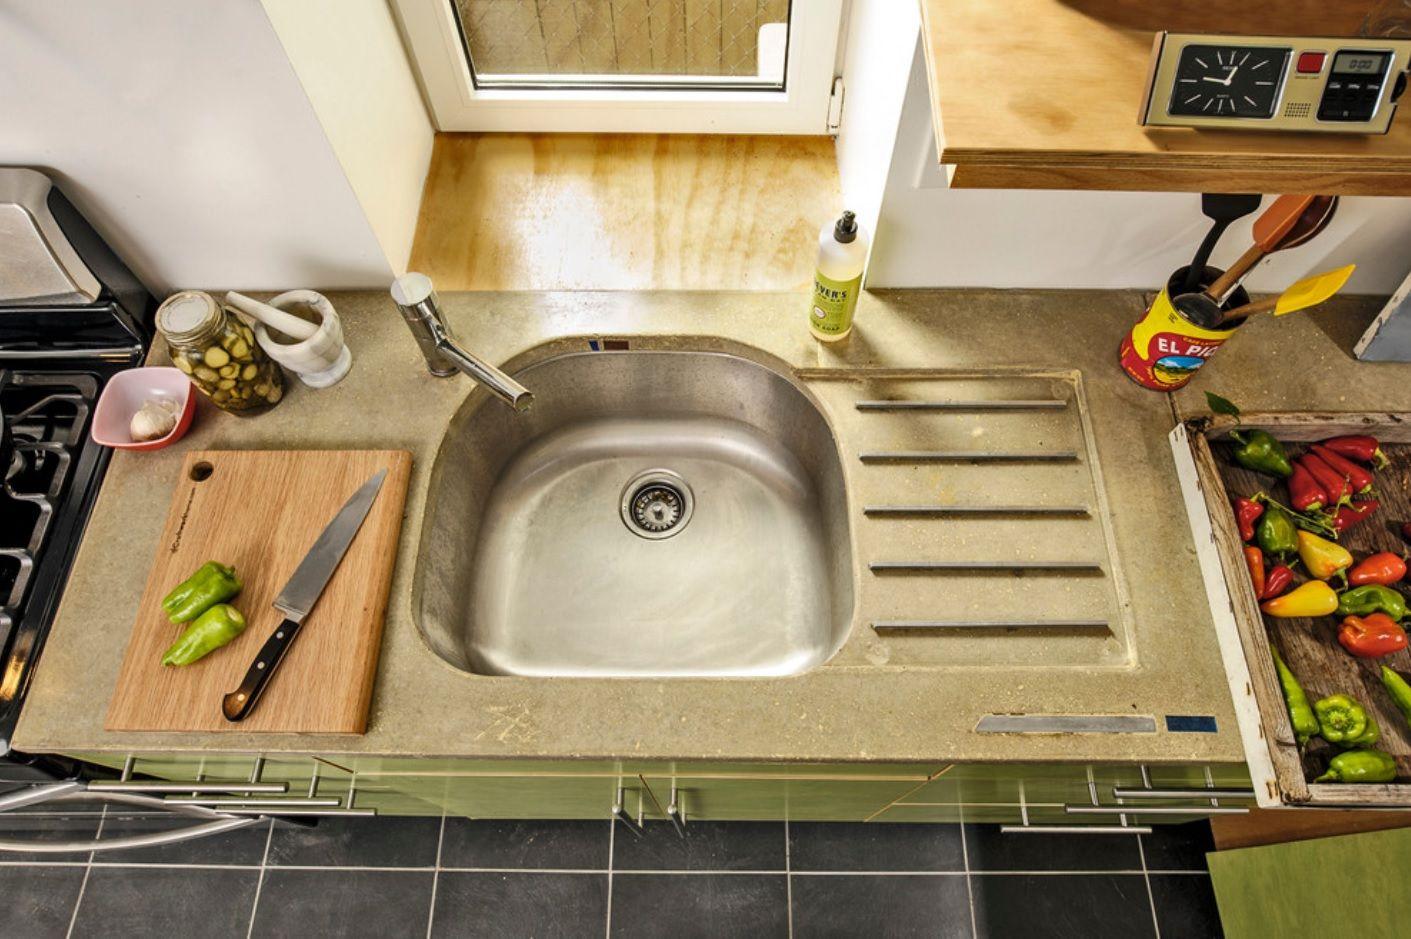 DIY Pouring Concrete Countertops. Interior Usage, Photos, Ideas. Steel sink built into concrete top